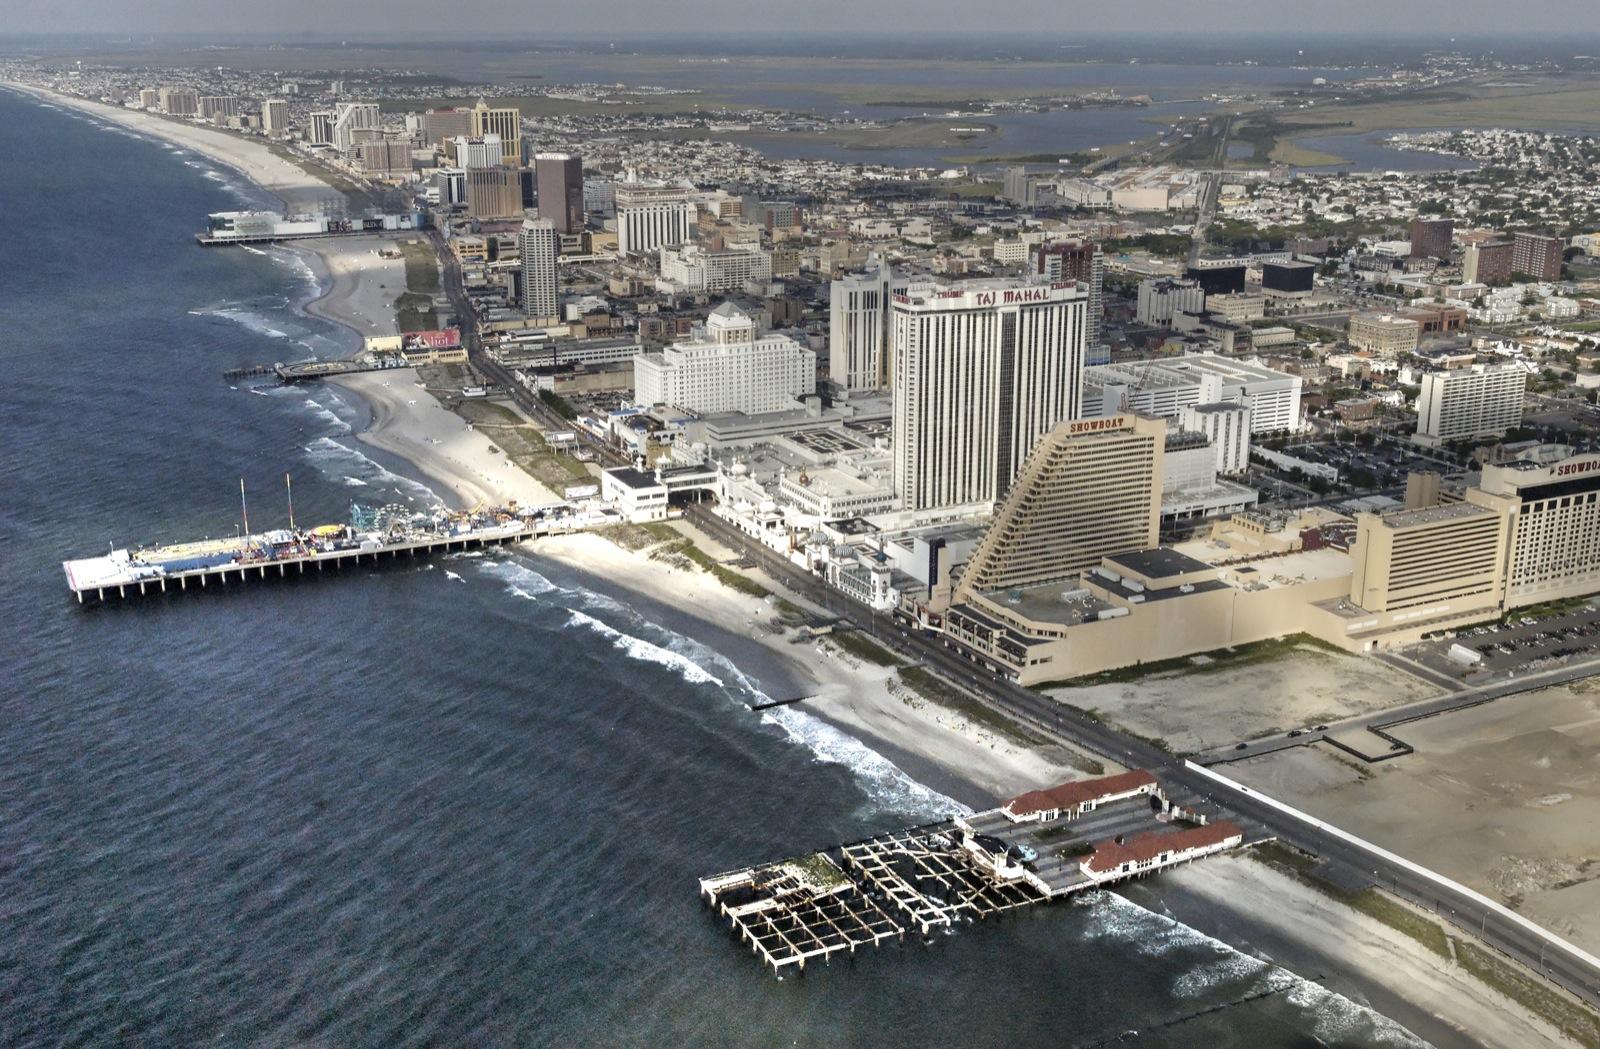 Atlantic City casino profits dropped in 2010